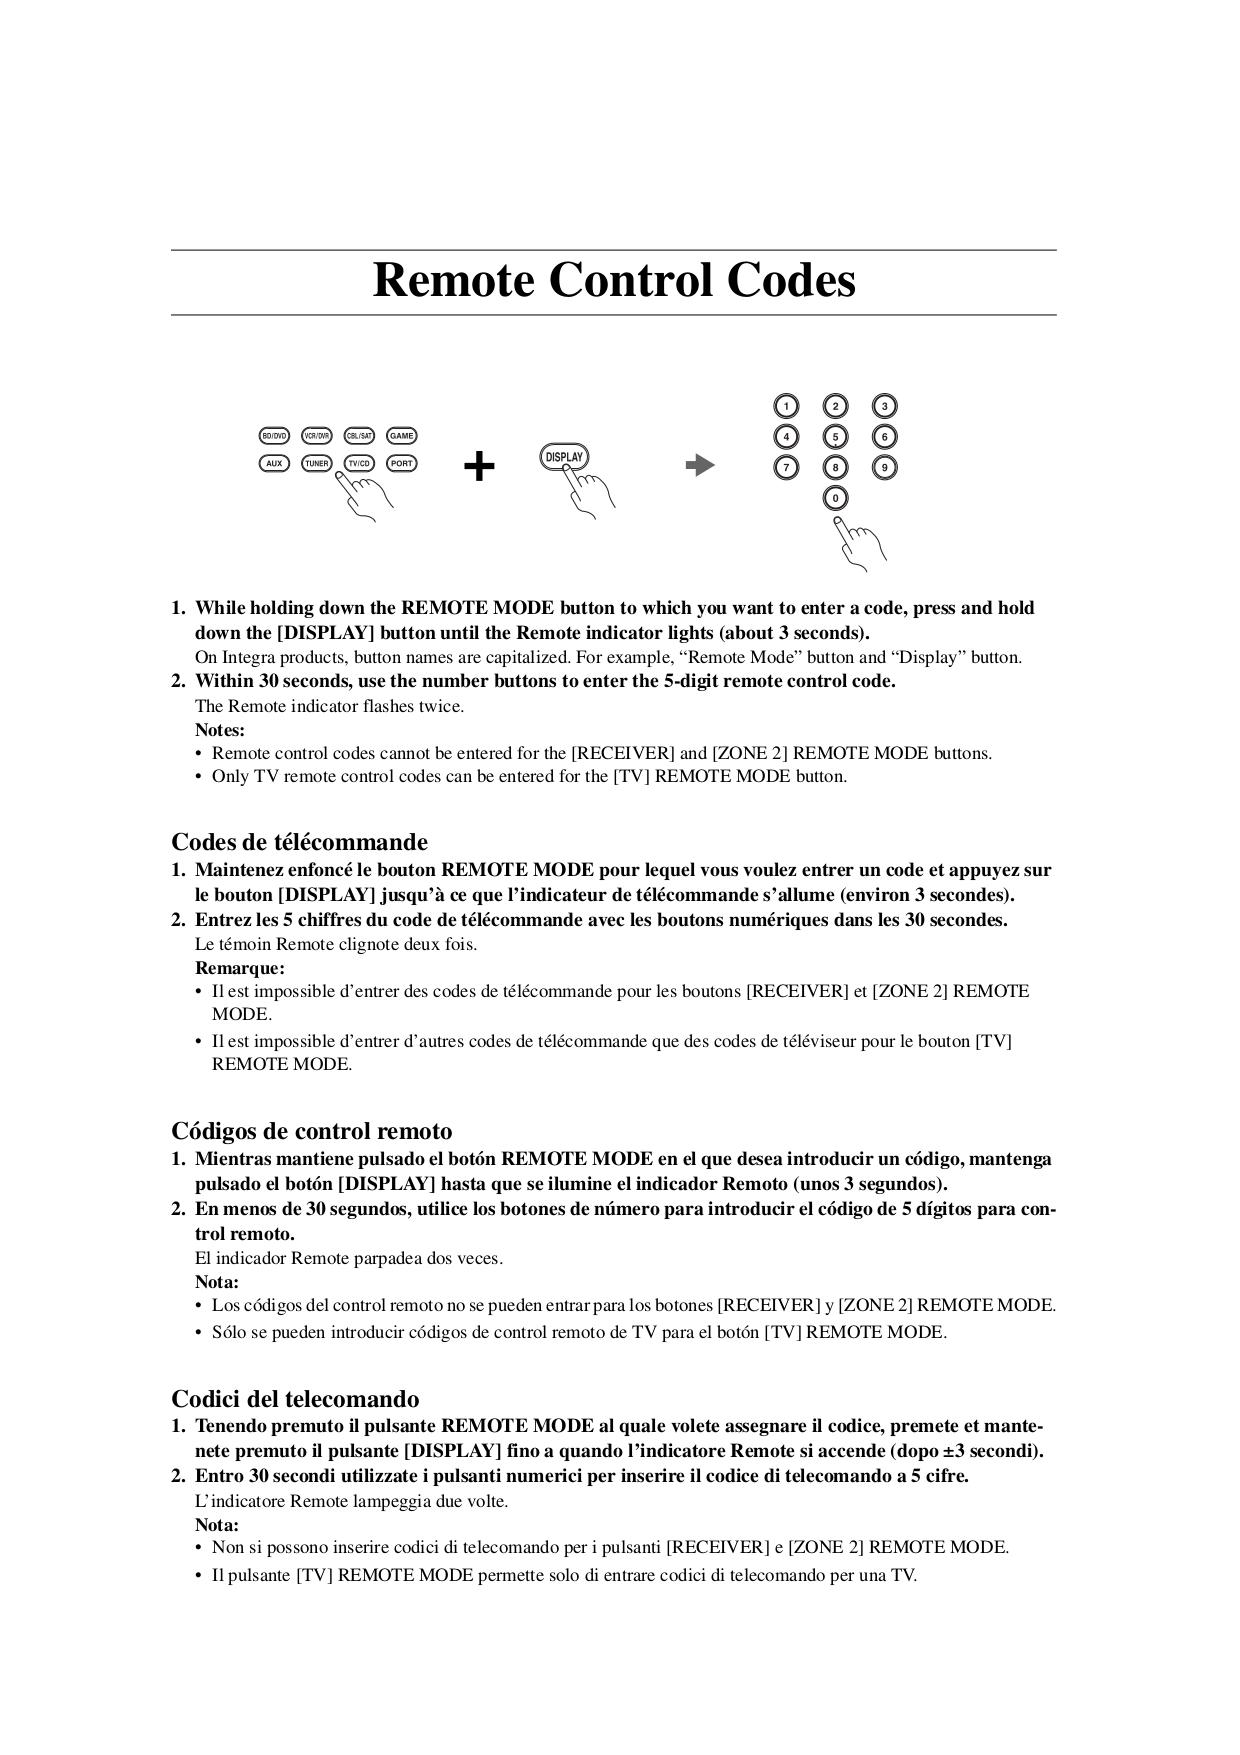 pdf for Lenoxx TV TV-5 manual